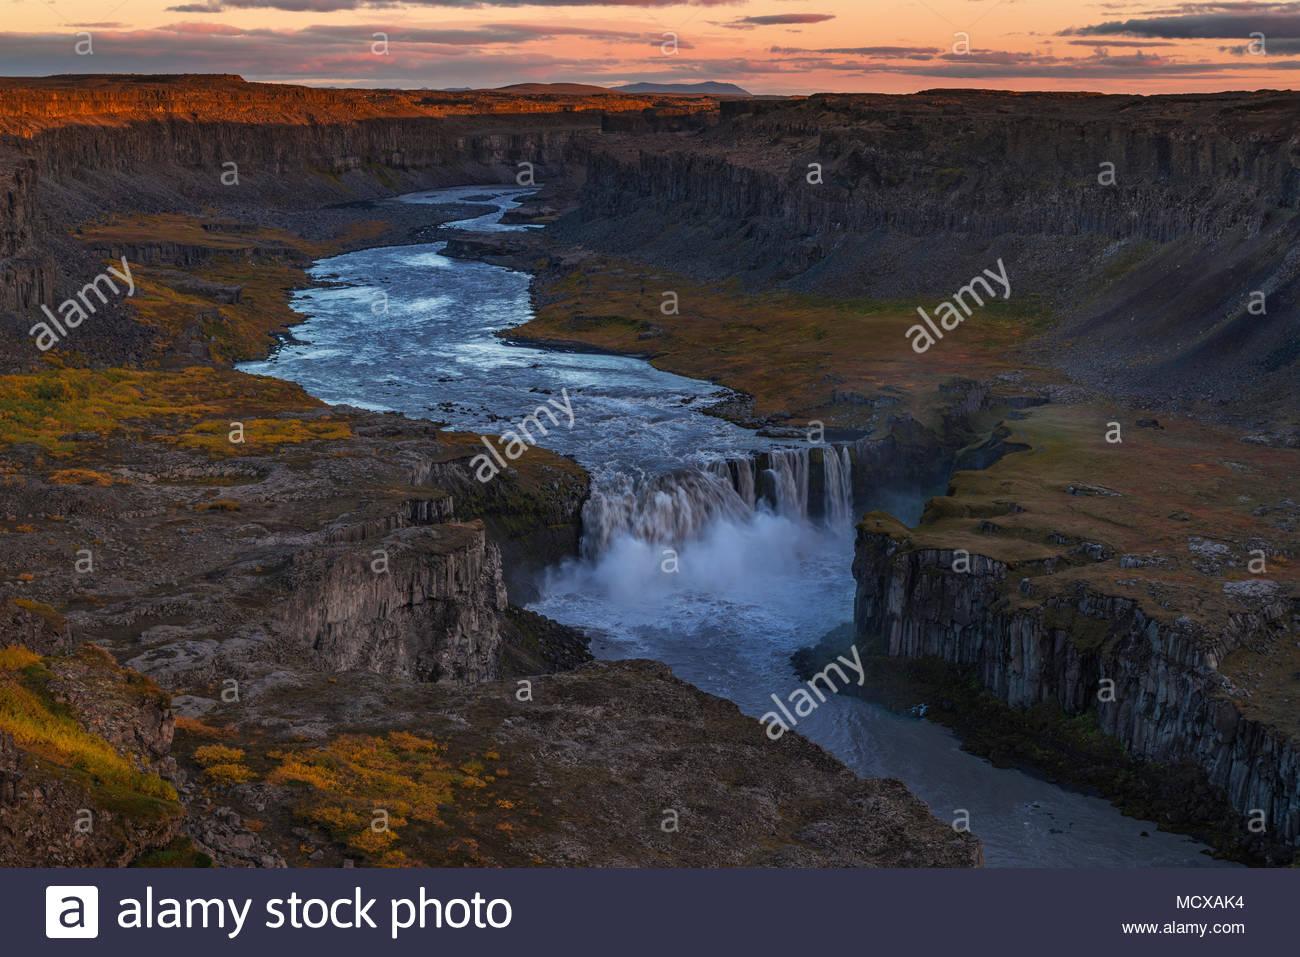 Hafragilsfoss Wasserfall Bei Abendrot Und Alphengluhen Im Herbst